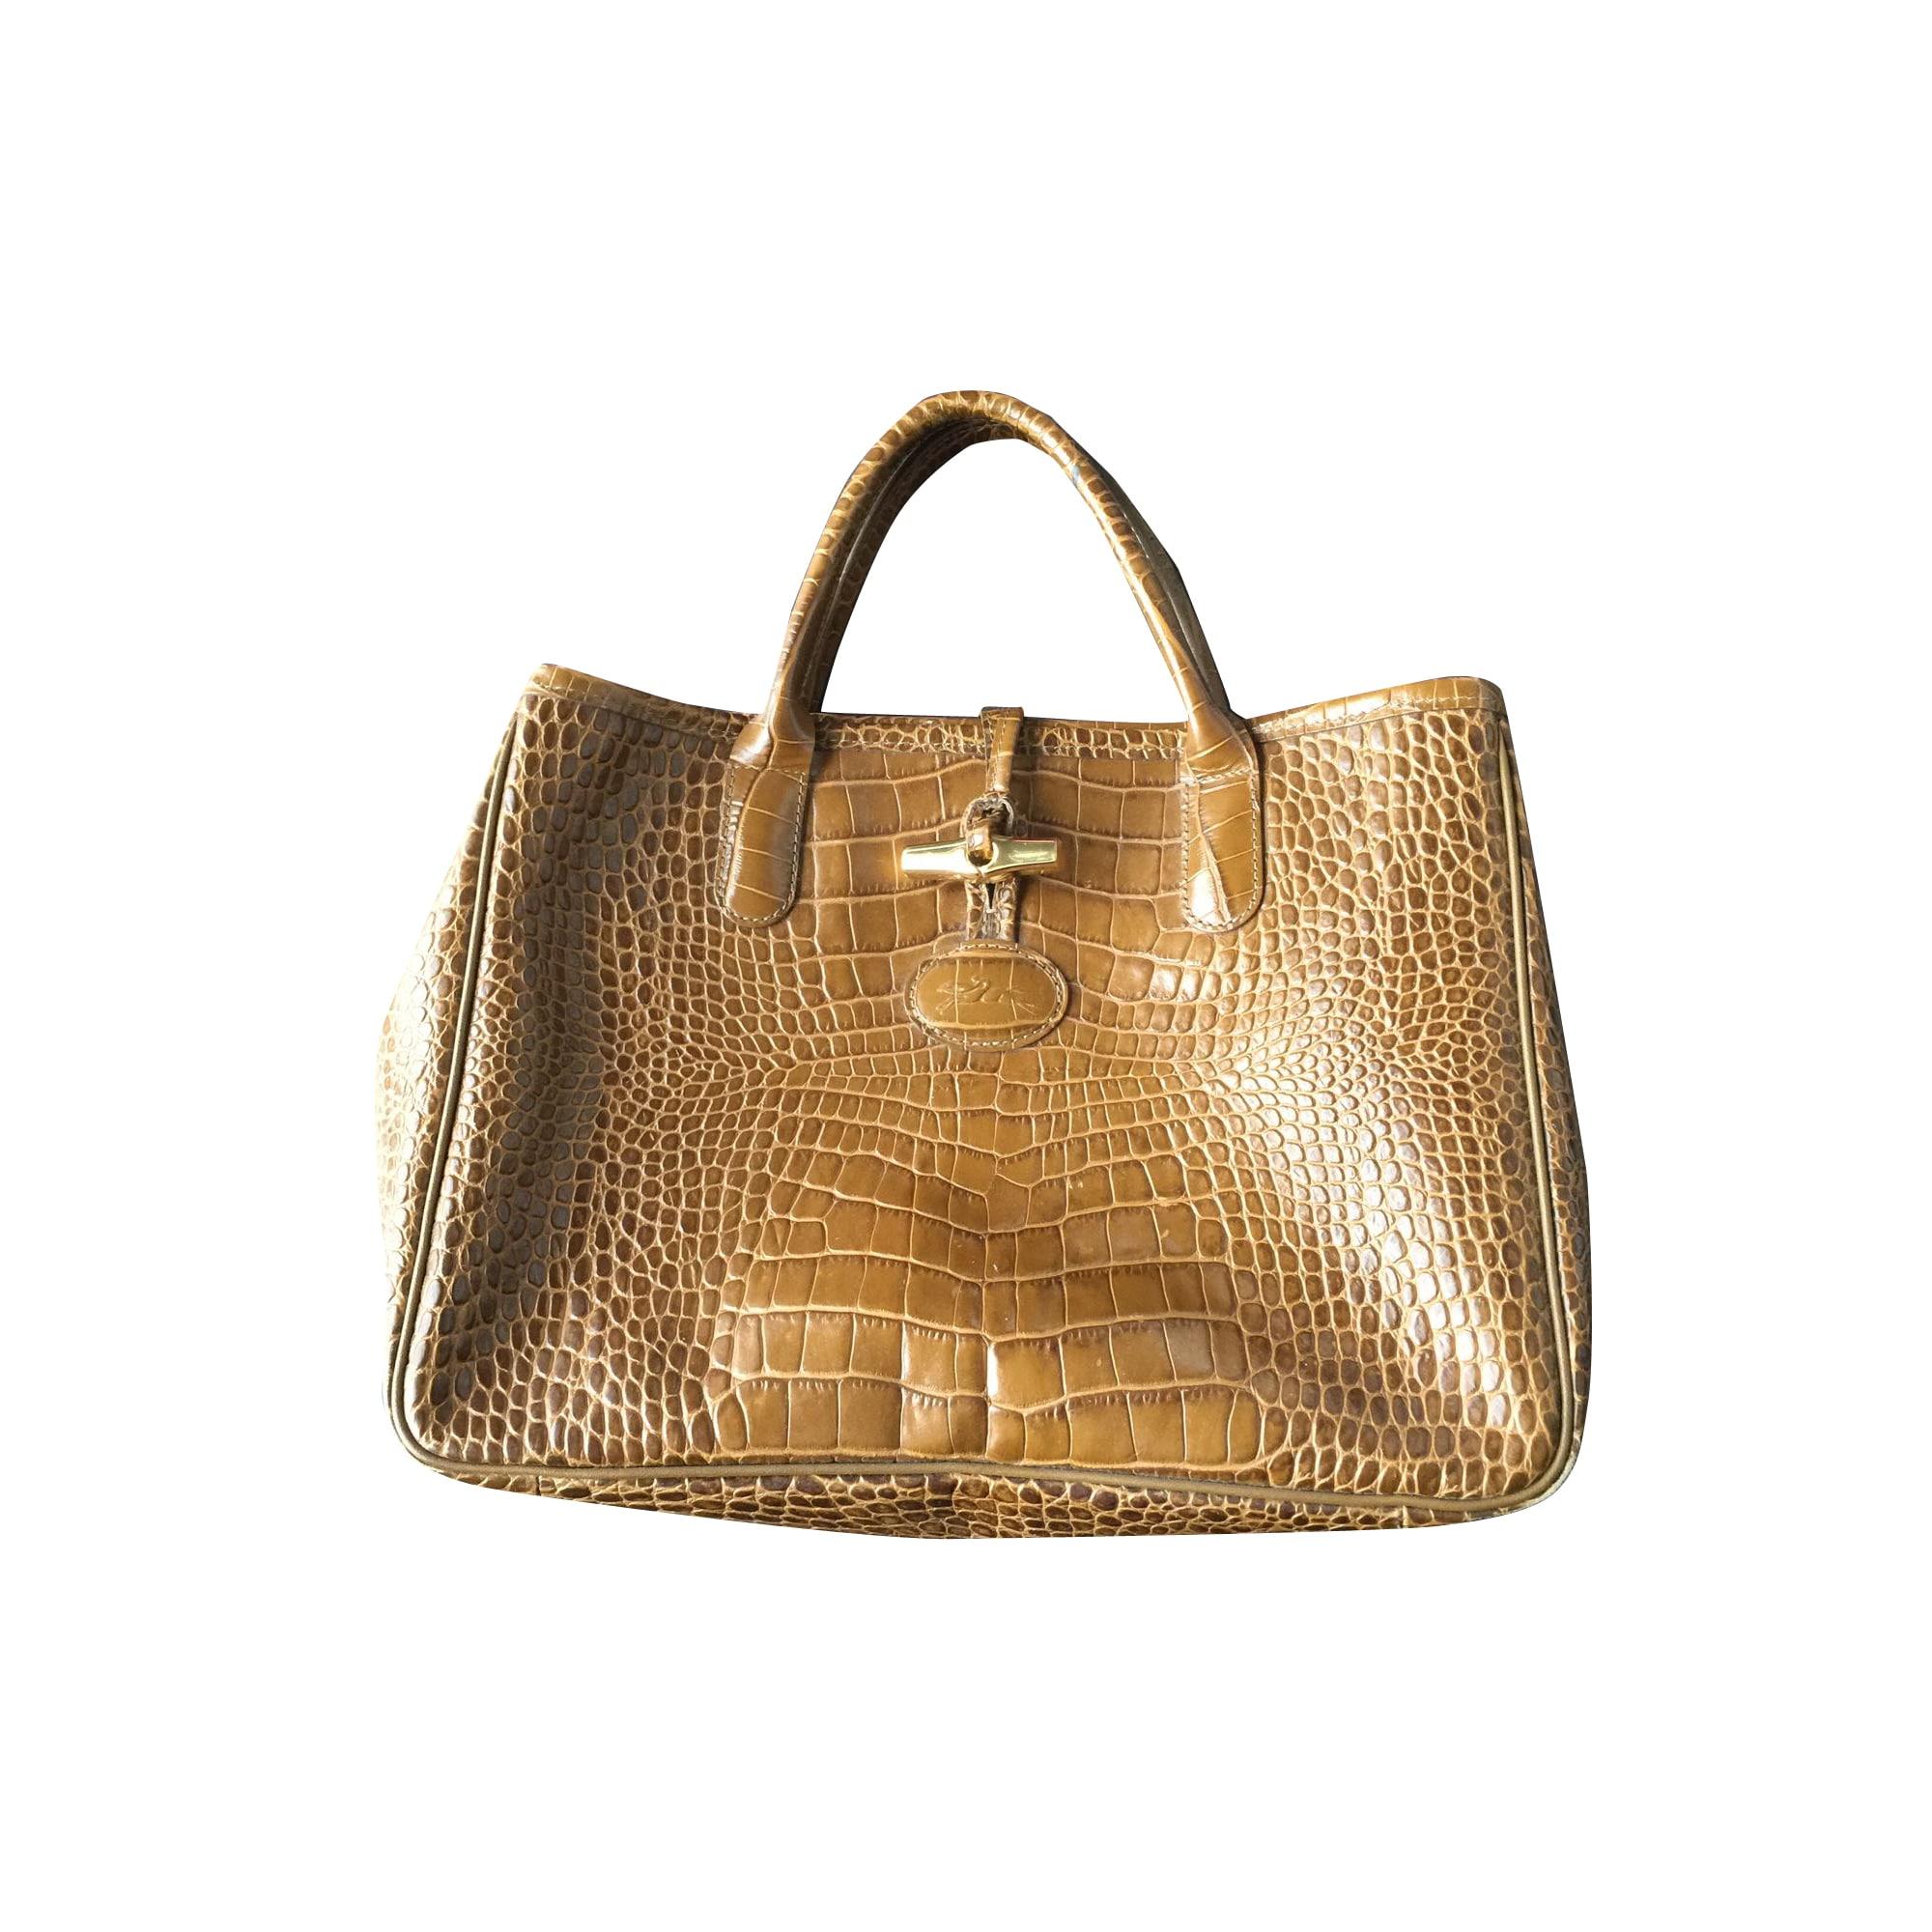 vuoto venduta Dressing De pelle Borsa marrone in sotto Longchamp aPwIYq